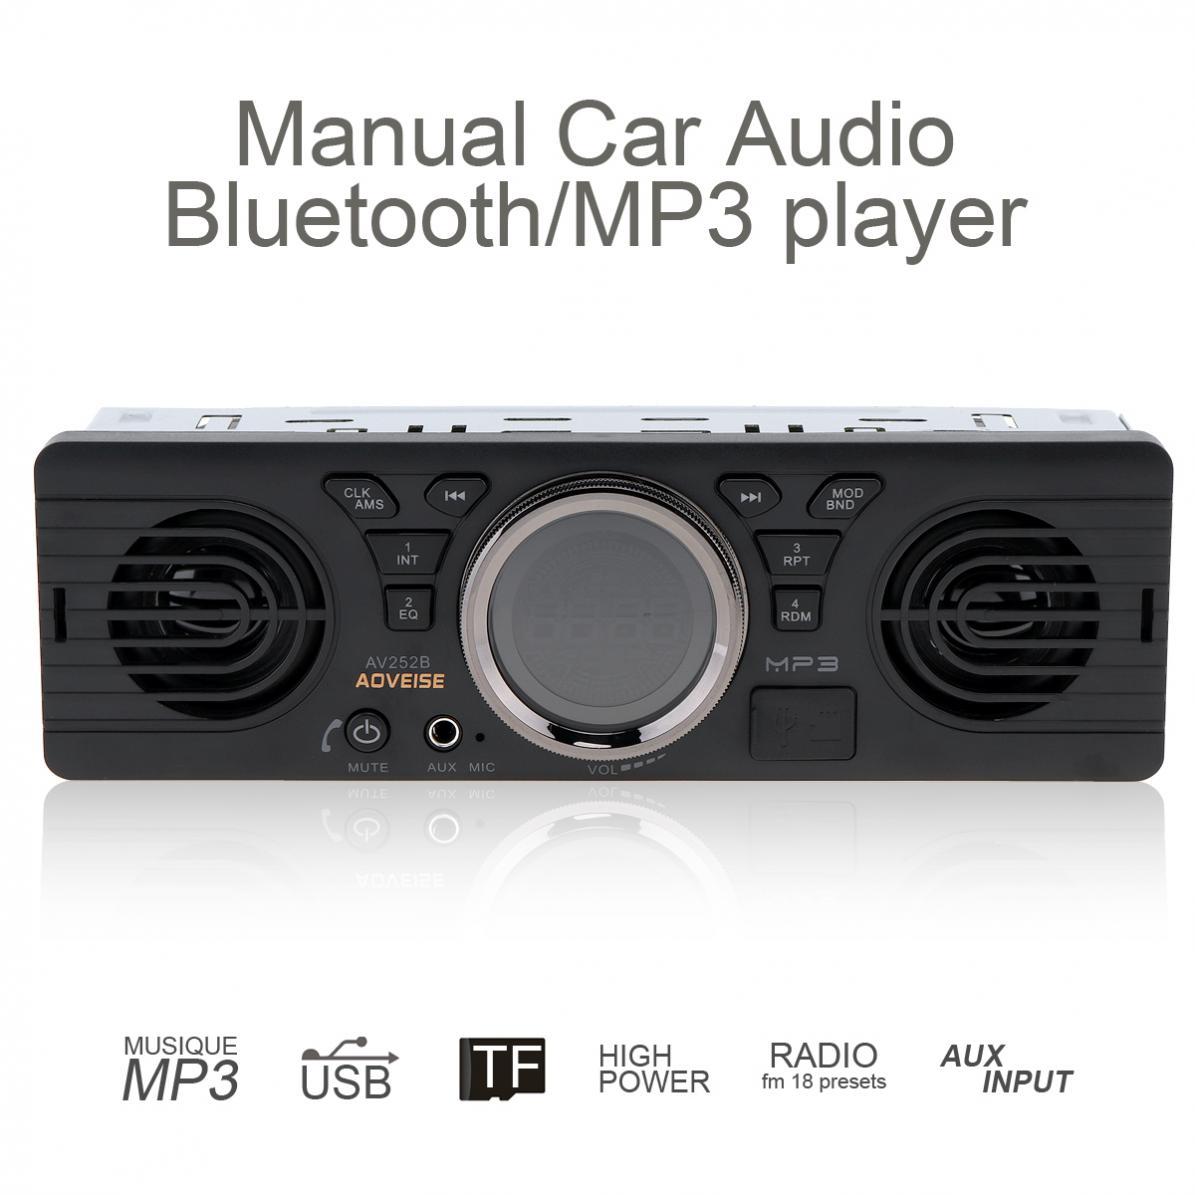 AOVEISE AV252B Bluetooth Transmitter Car FM Mp3 Player 12V Car Dual Horn MP3 Audio Player Vehicle Stereo Support FM/USB/AUX